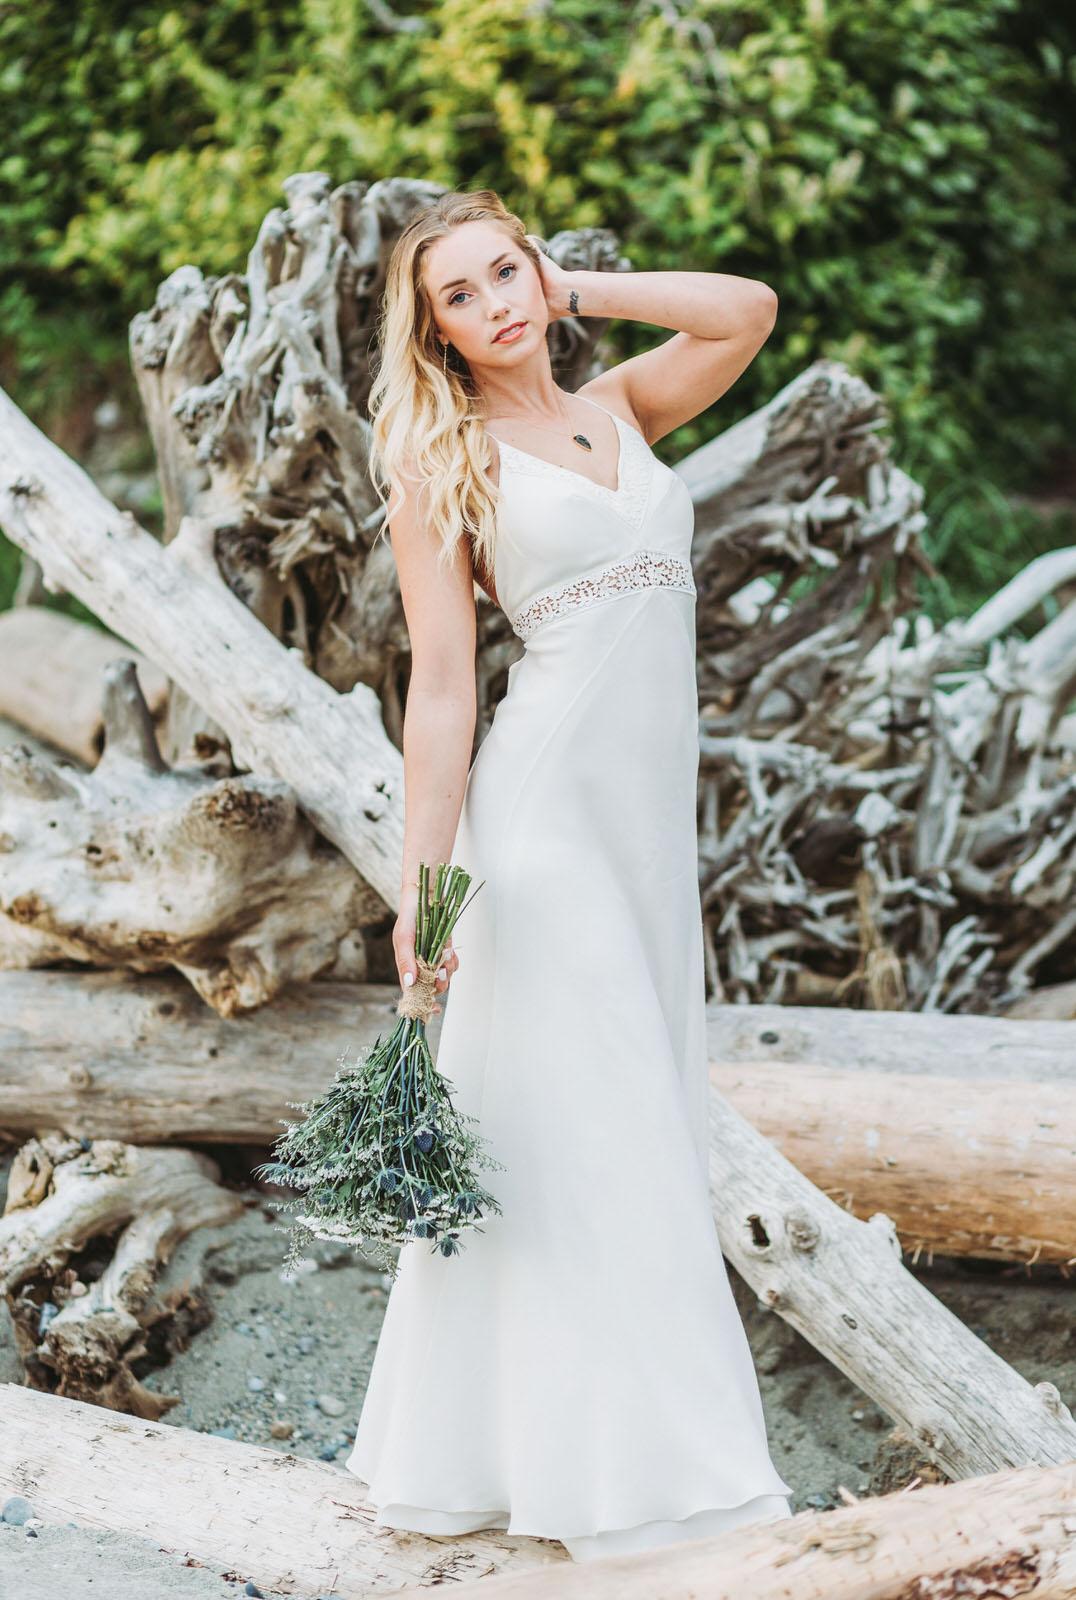 Jennifer Picard Photography - Vancouver Wedding Photographer - Sunshine Coast Wedding Photographer - Bridal InspirationIMG_9616.jpg